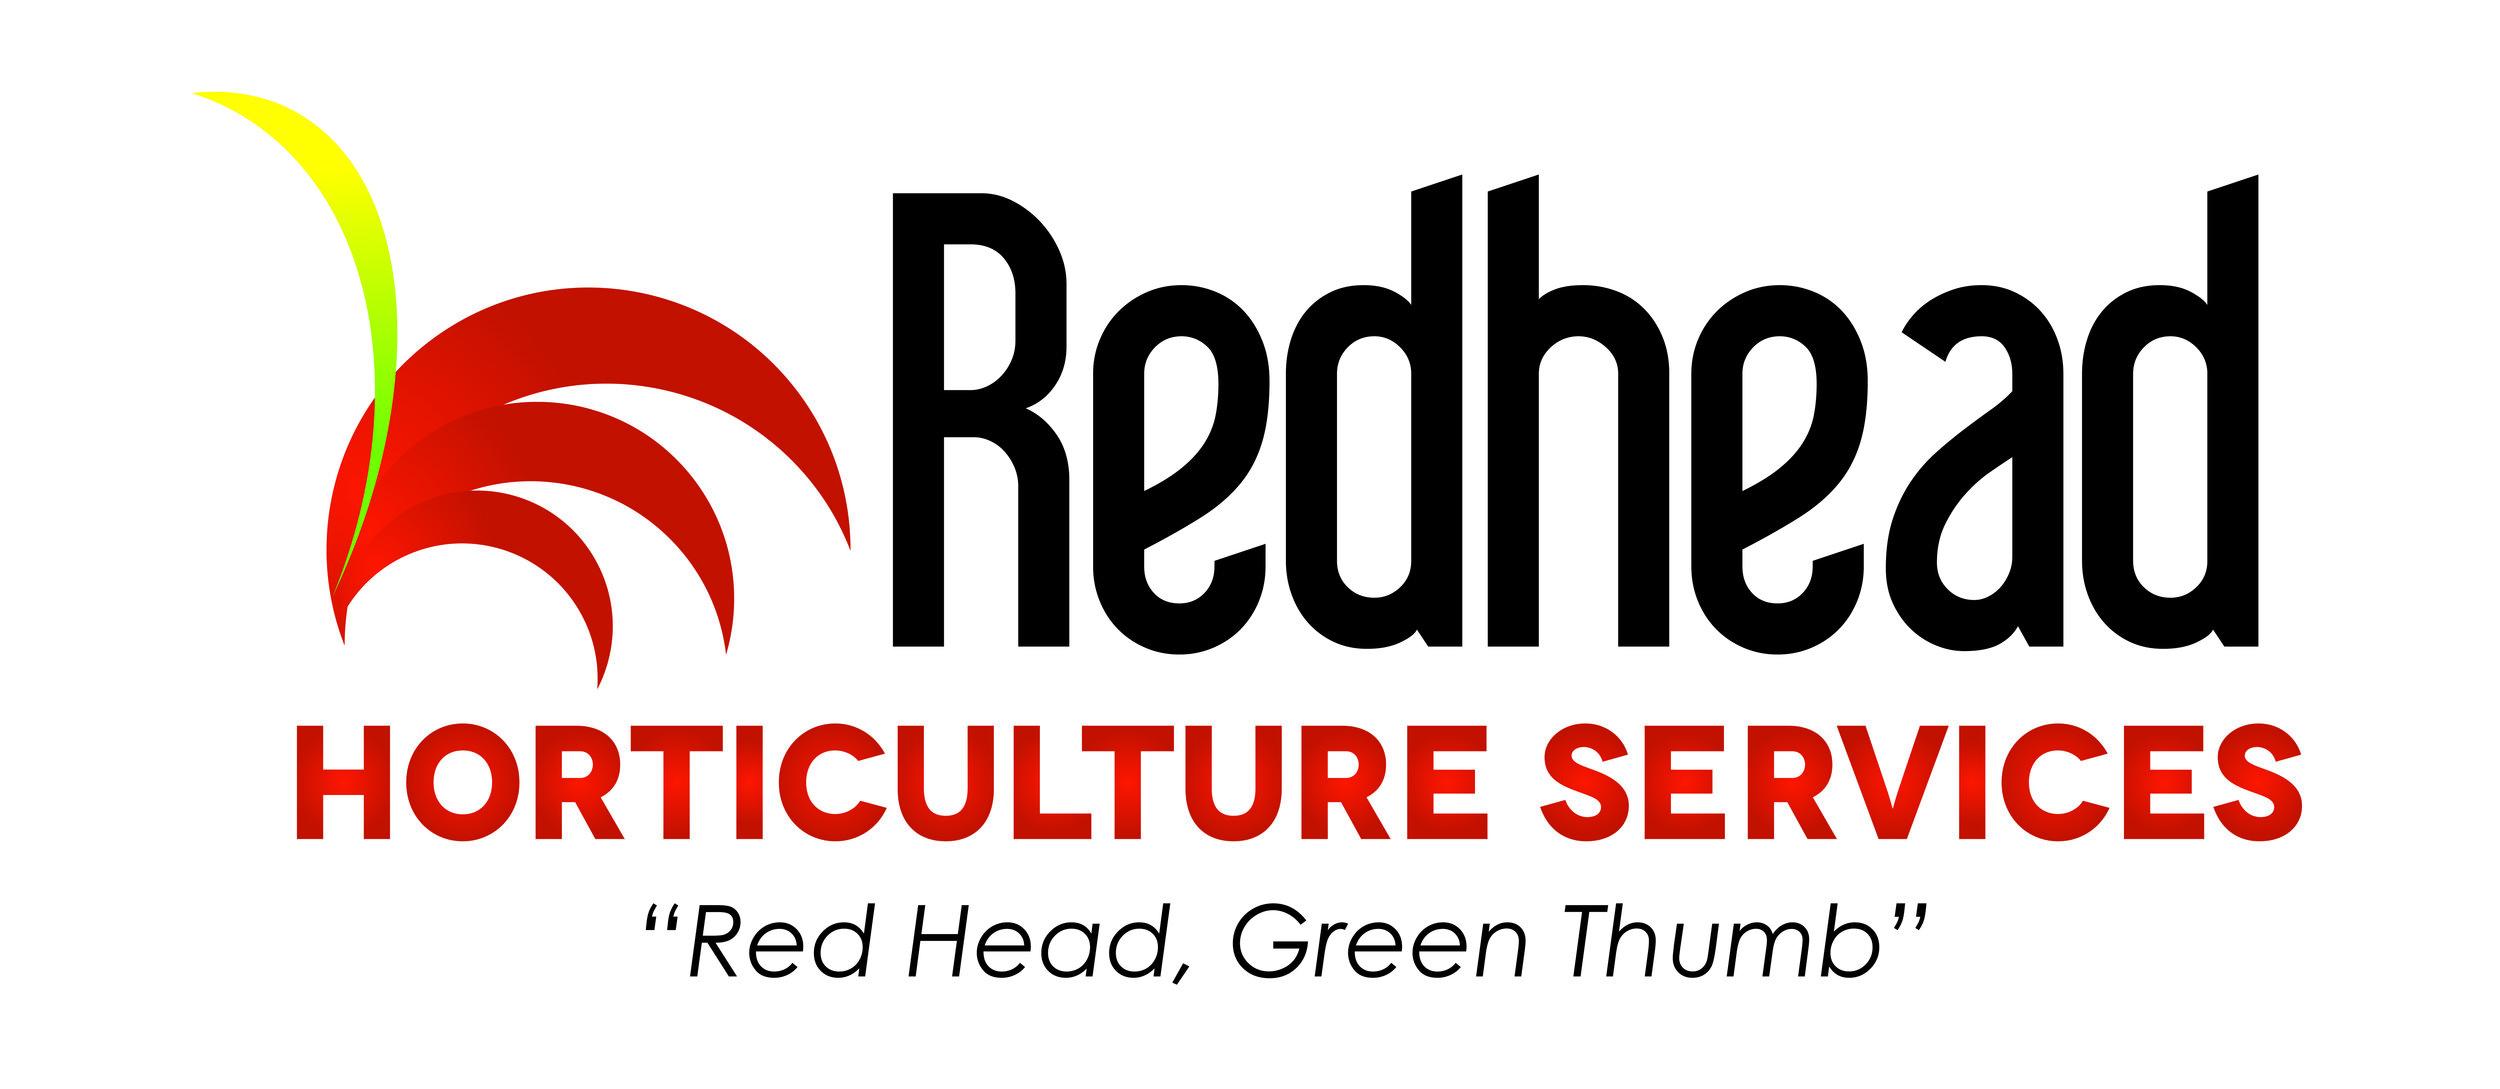 Red Head Logo.jpg